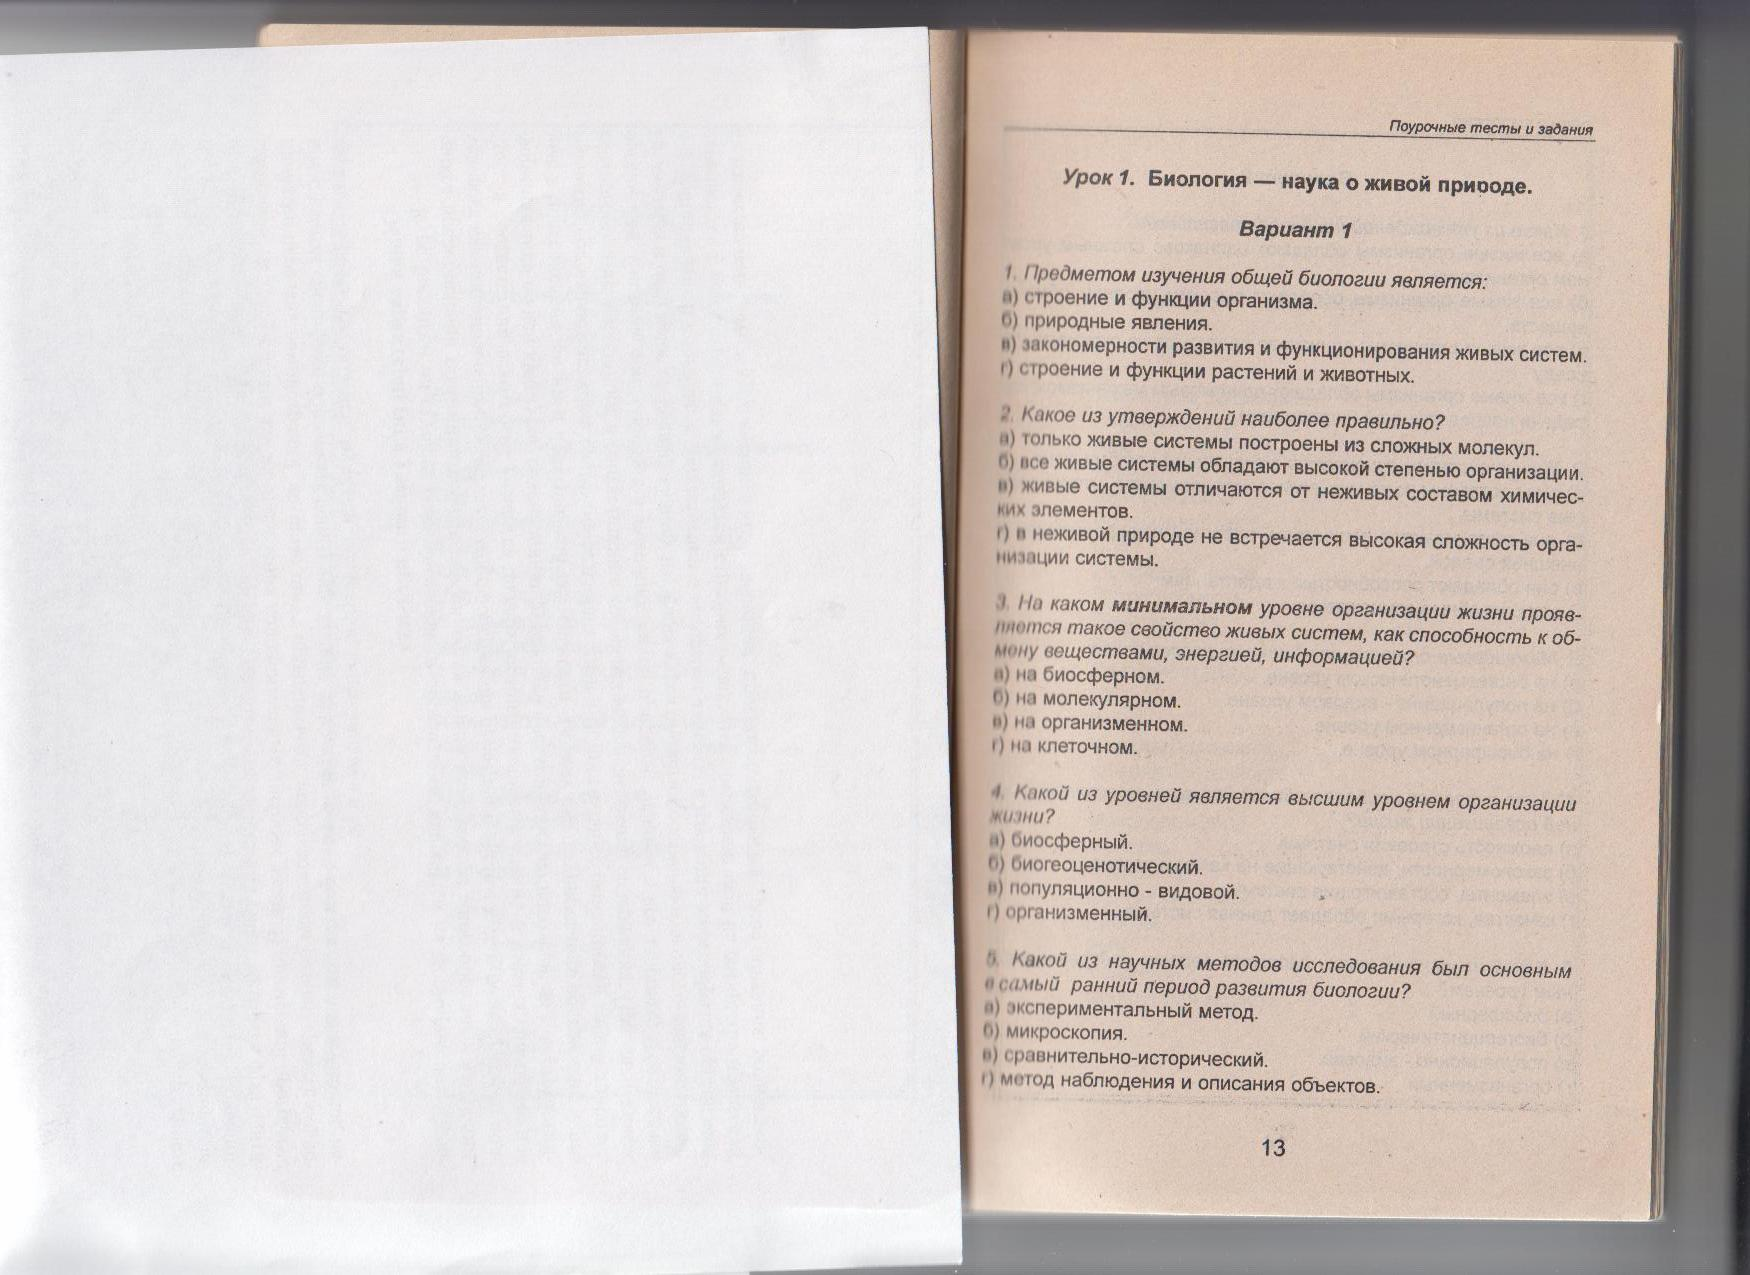 C:\Documents and Settings\Admin\Рабочий стол\10-11 класс к.р\Изображение.jpg